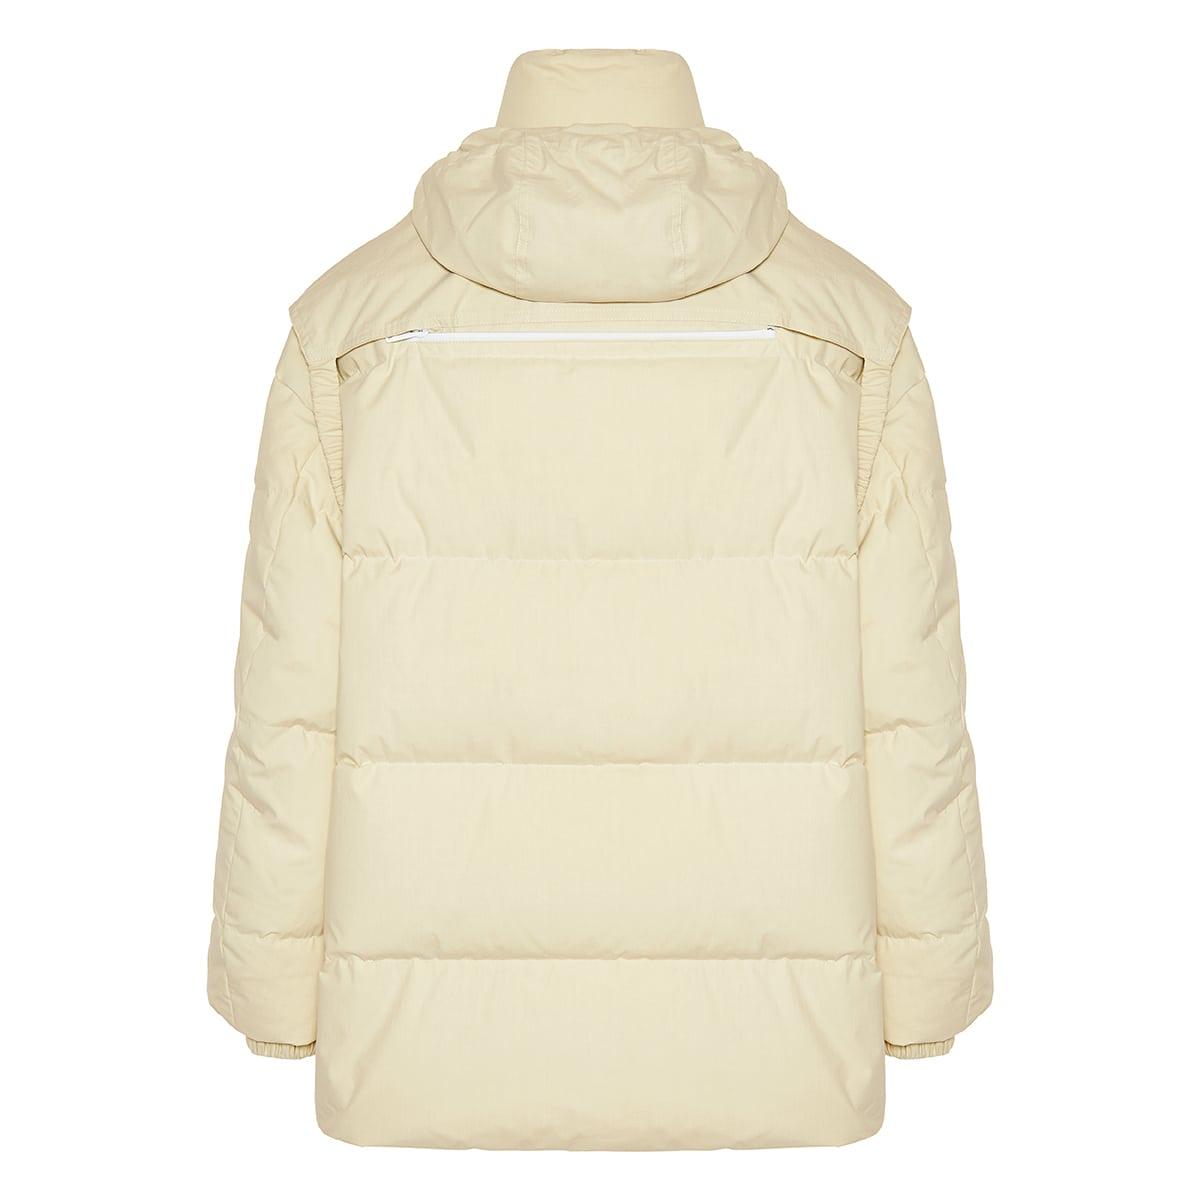 Oversized cotton puffer jacket